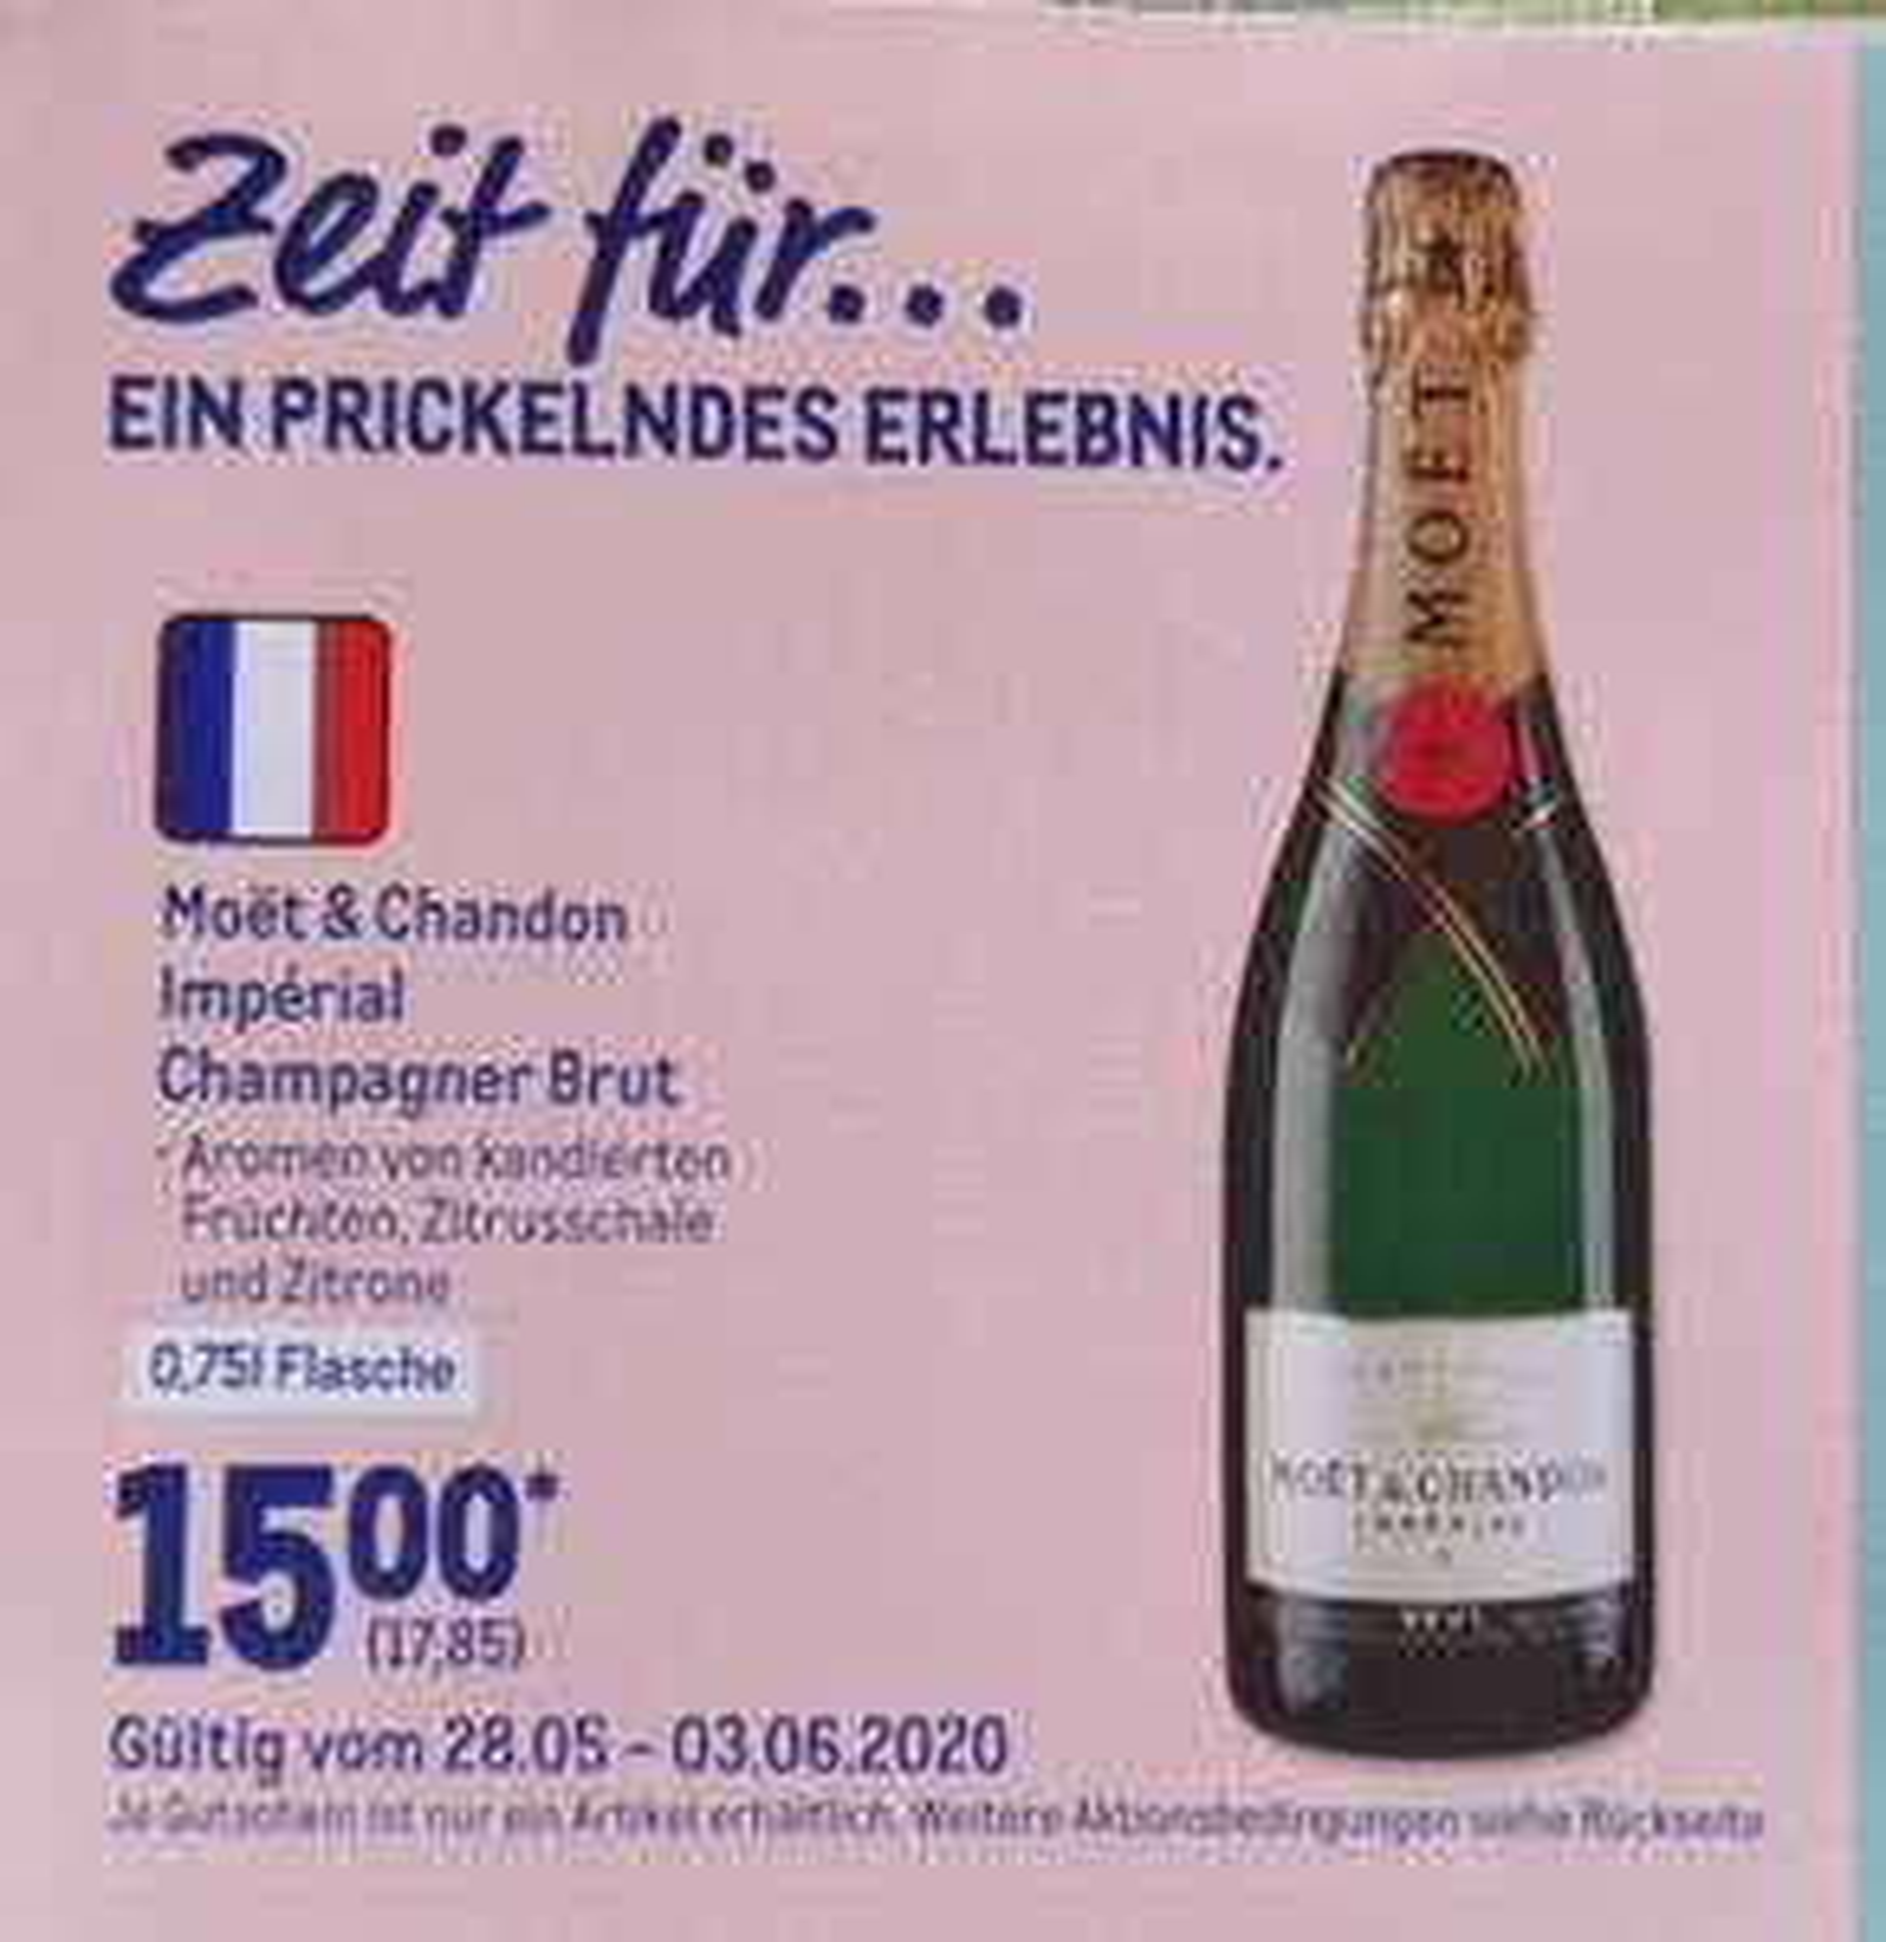 [Metro] Moet & Chandon Imperial Champagner Brut 0.7 Liter